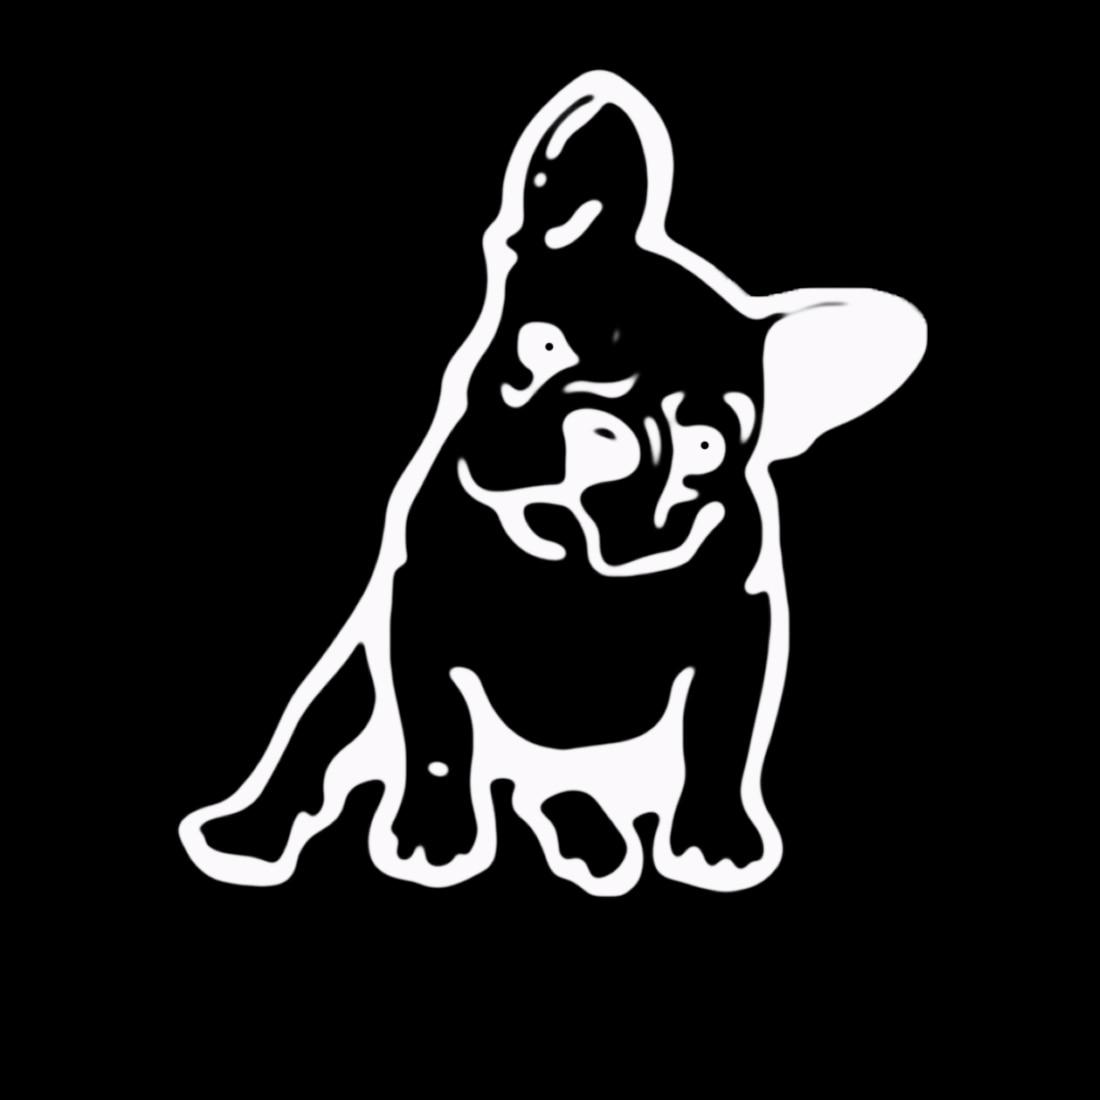 Dewtreetali 11.5*12.7CM FRENCH BULLDOG Dog Vinyl Decal Window Decoration Lovely Animal Car Sticker Black/White